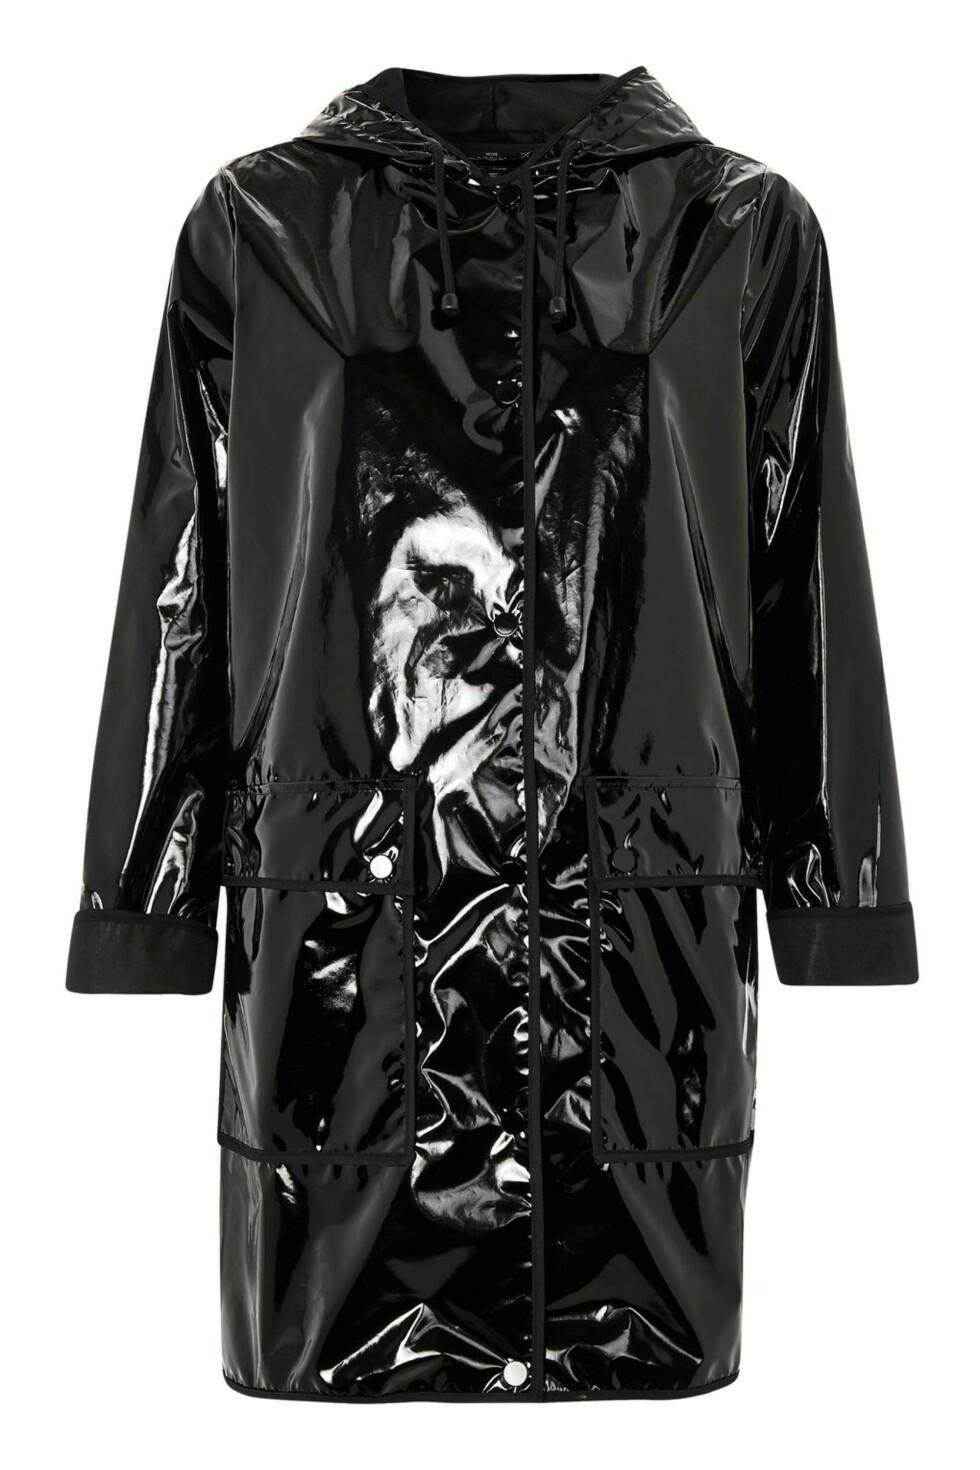 Regnjakke fra Topshop | kr 466 | http://www.topshop.com/en/tsuk/product/vinyl-hooded-rain-mac-6573384?bi=0&ps=20&Ntt=rain%20coat